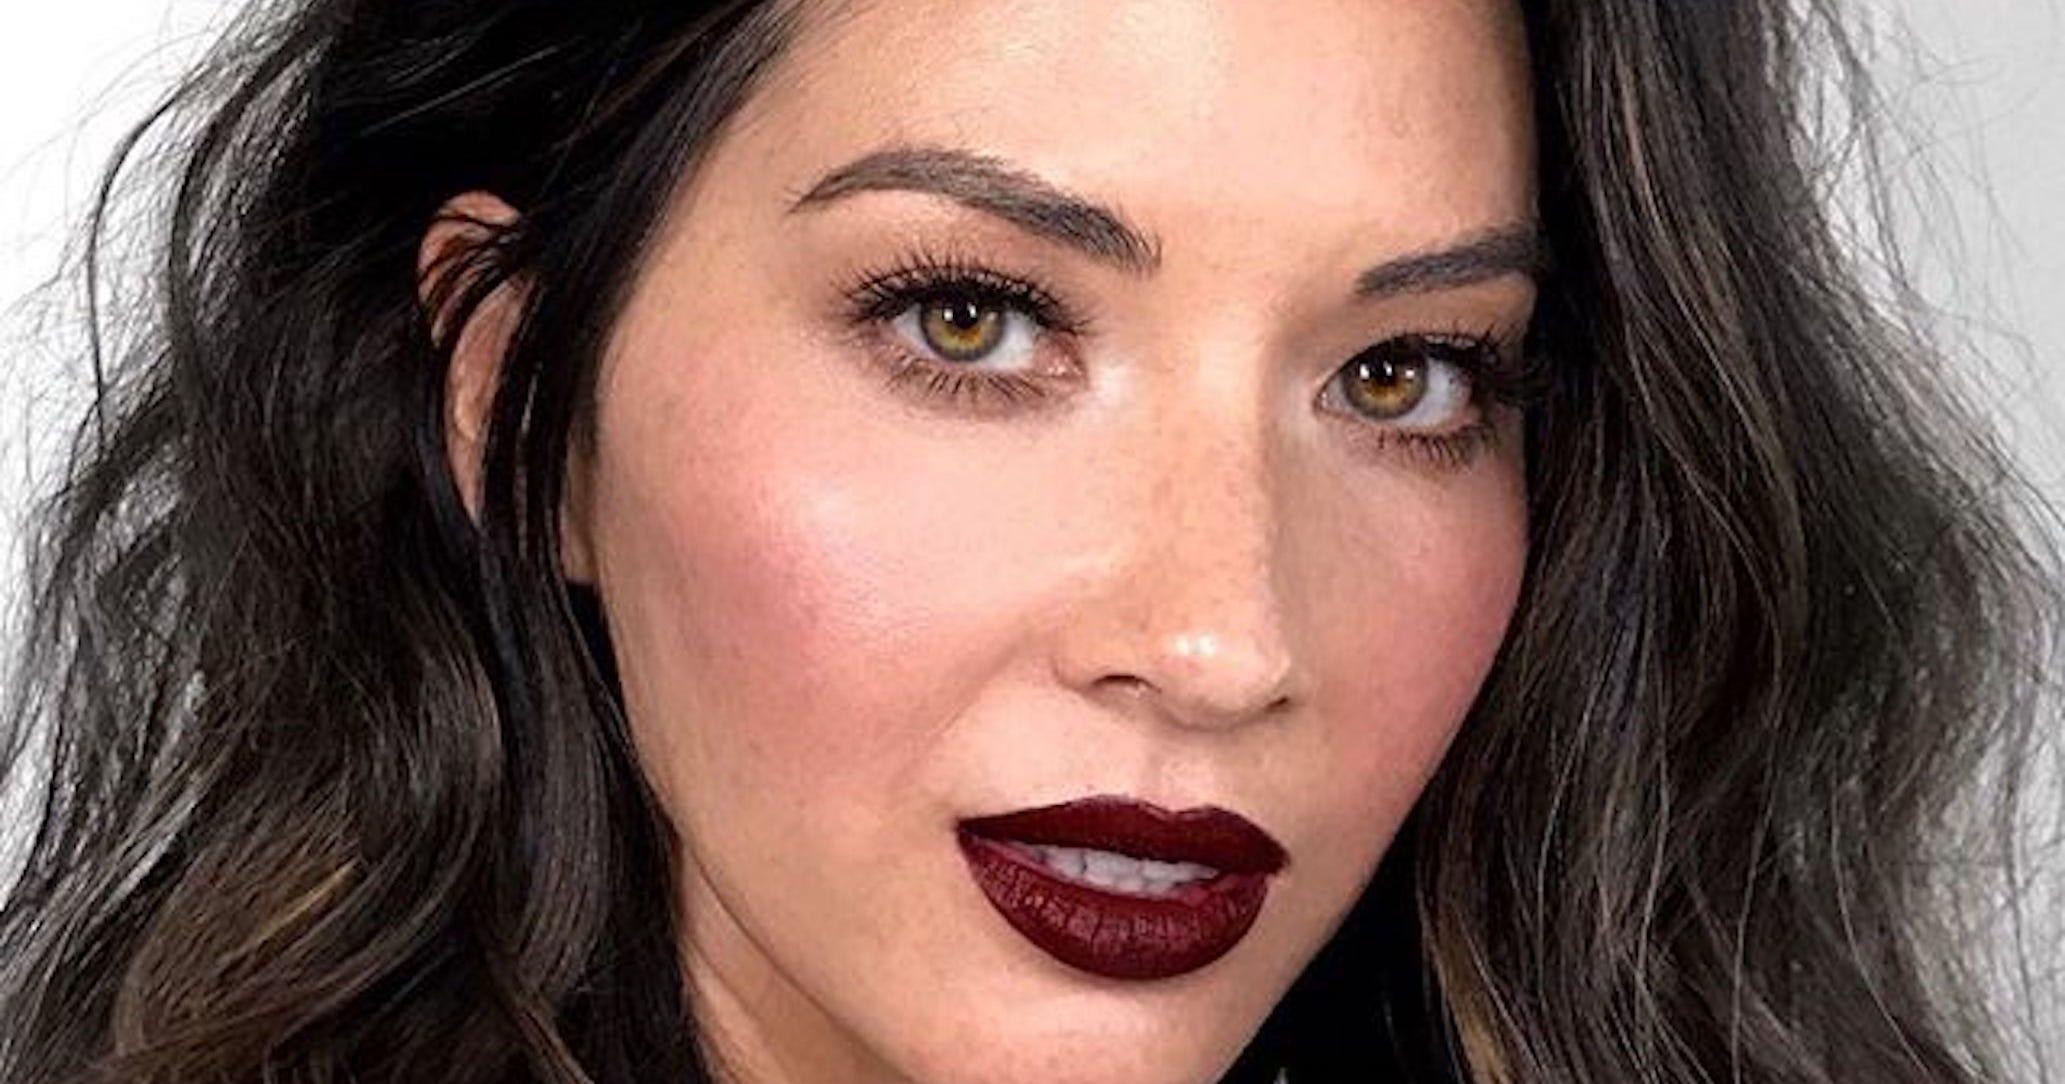 This Celeb Trick Makes Dark Lipstick Look SO Much Better